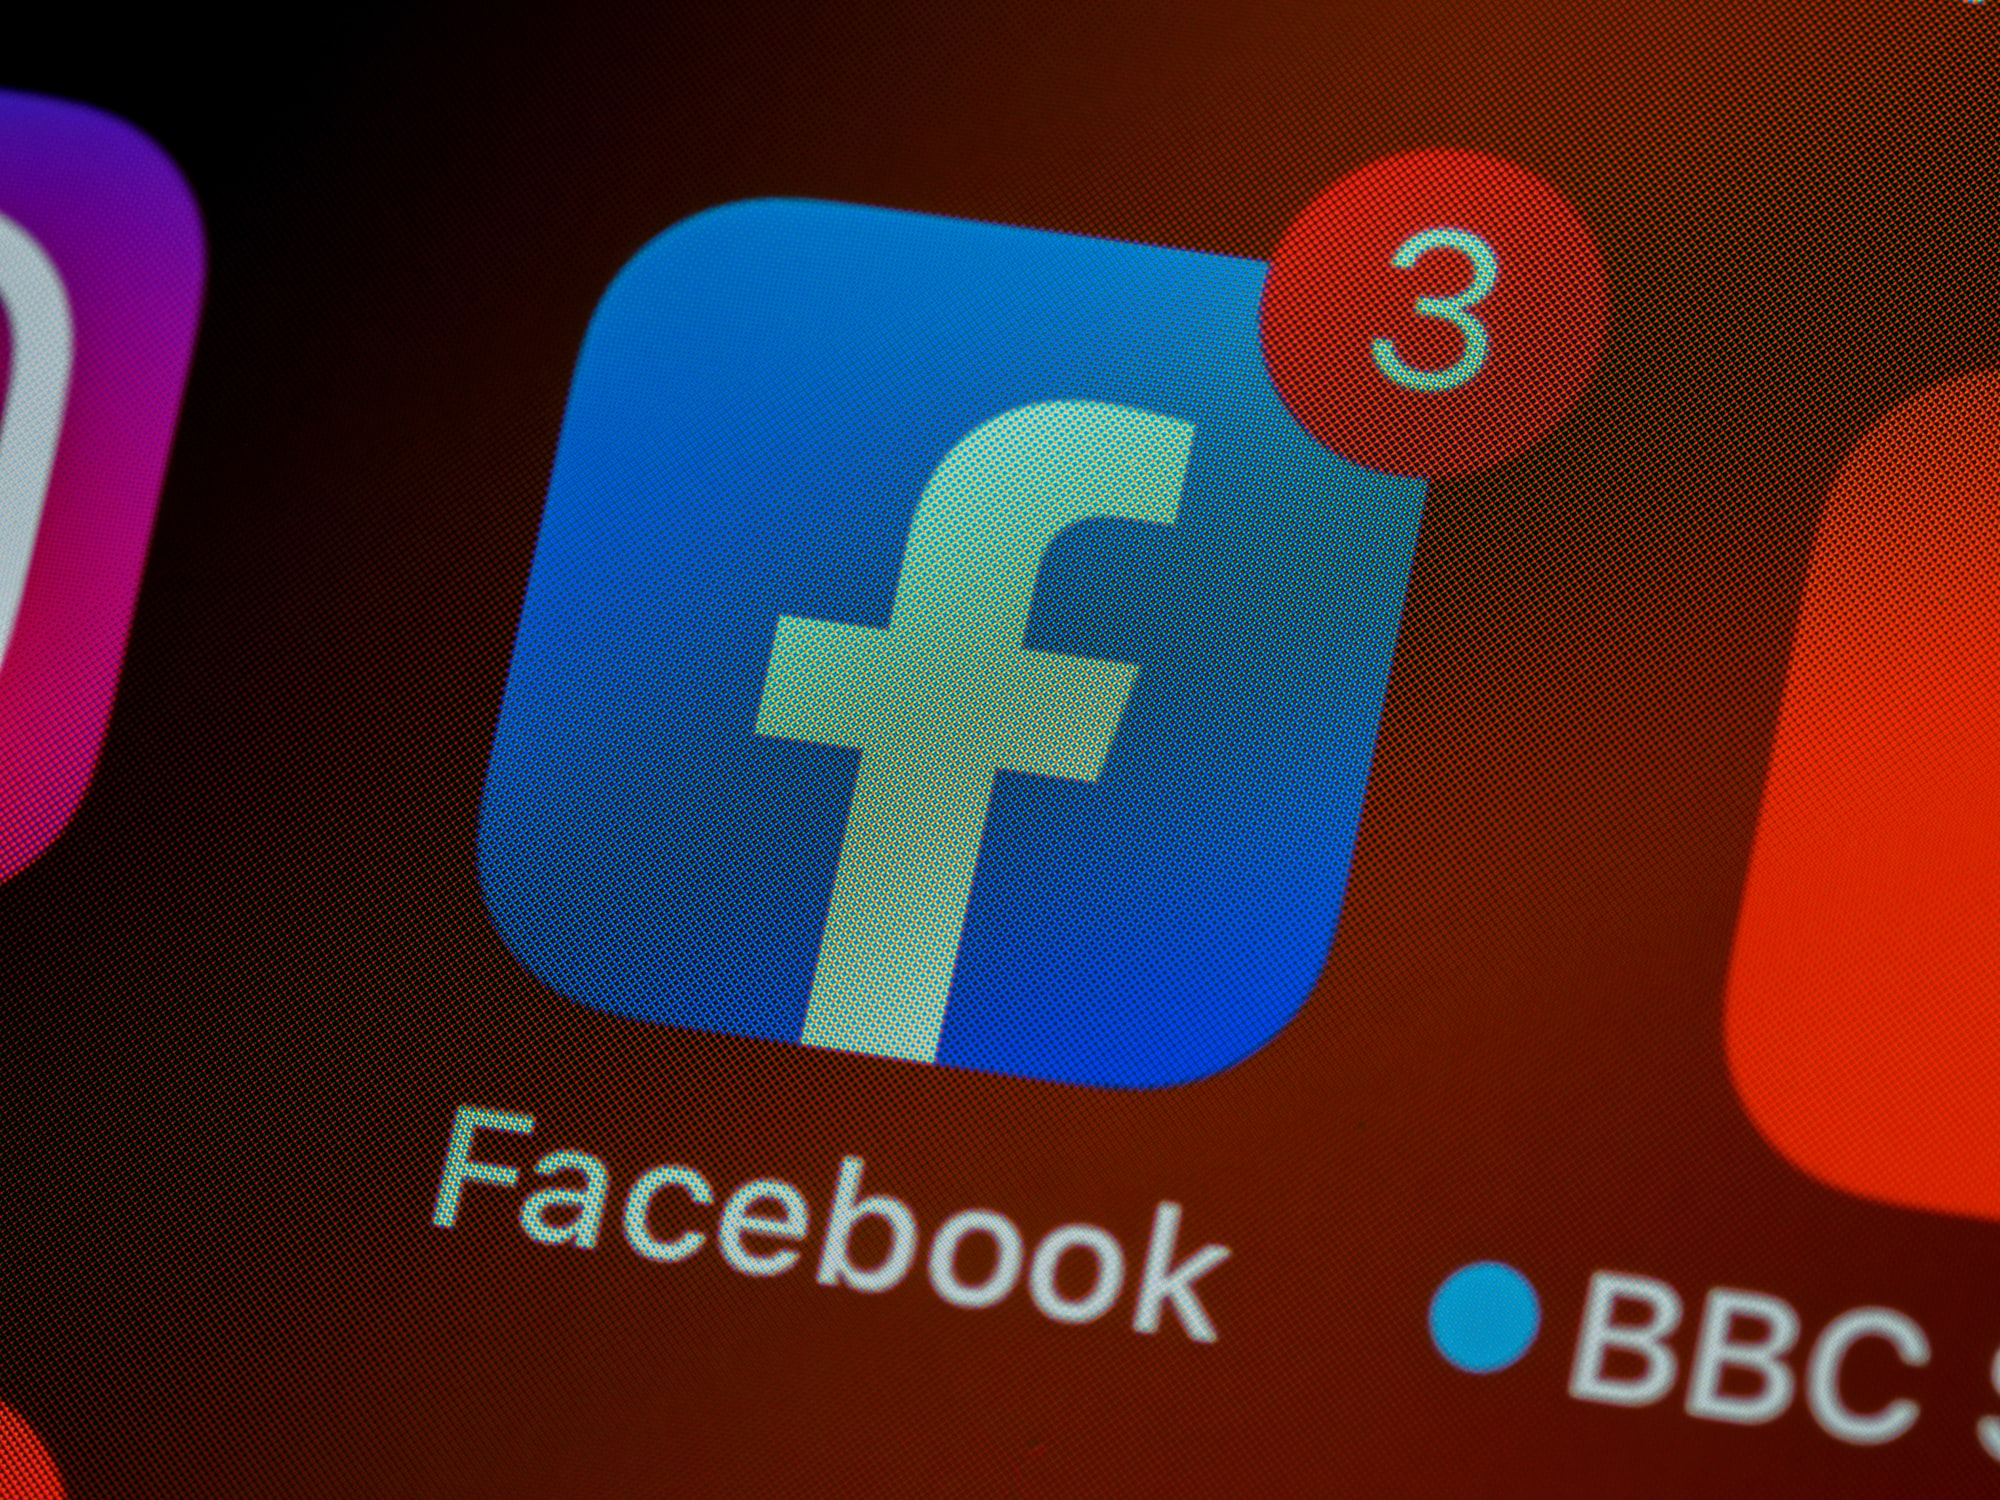 Facebook's Secret Blacklist